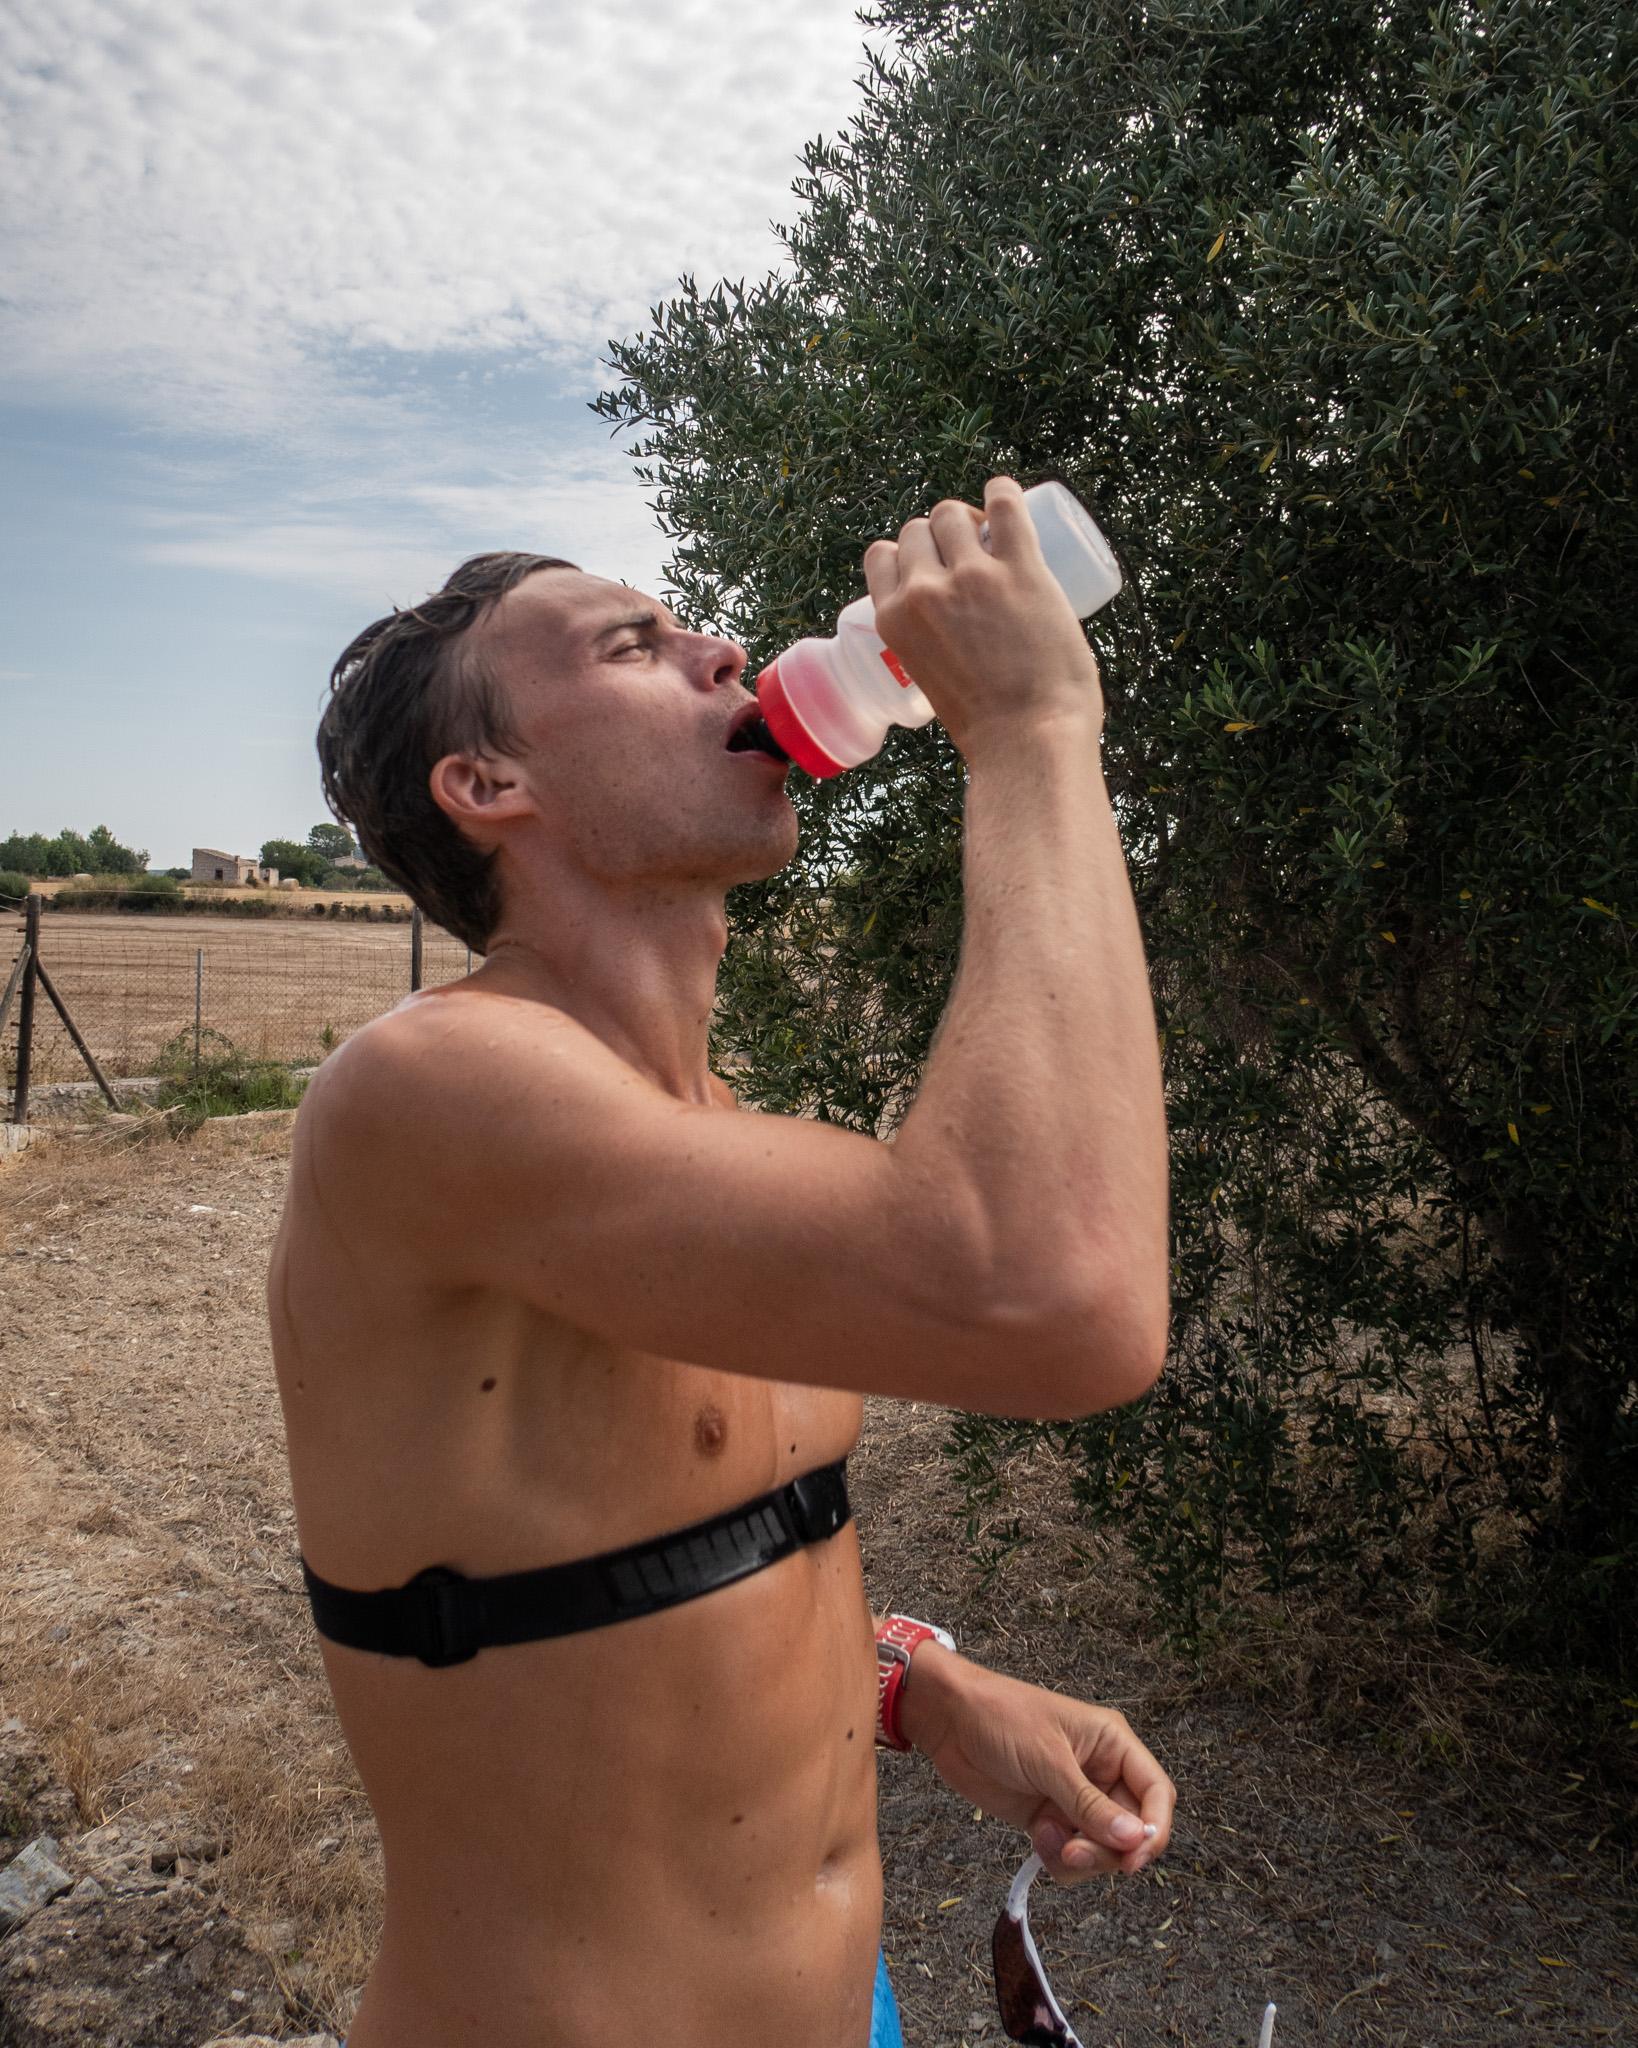 running-in-heat-aug-2018-water-34.jpg